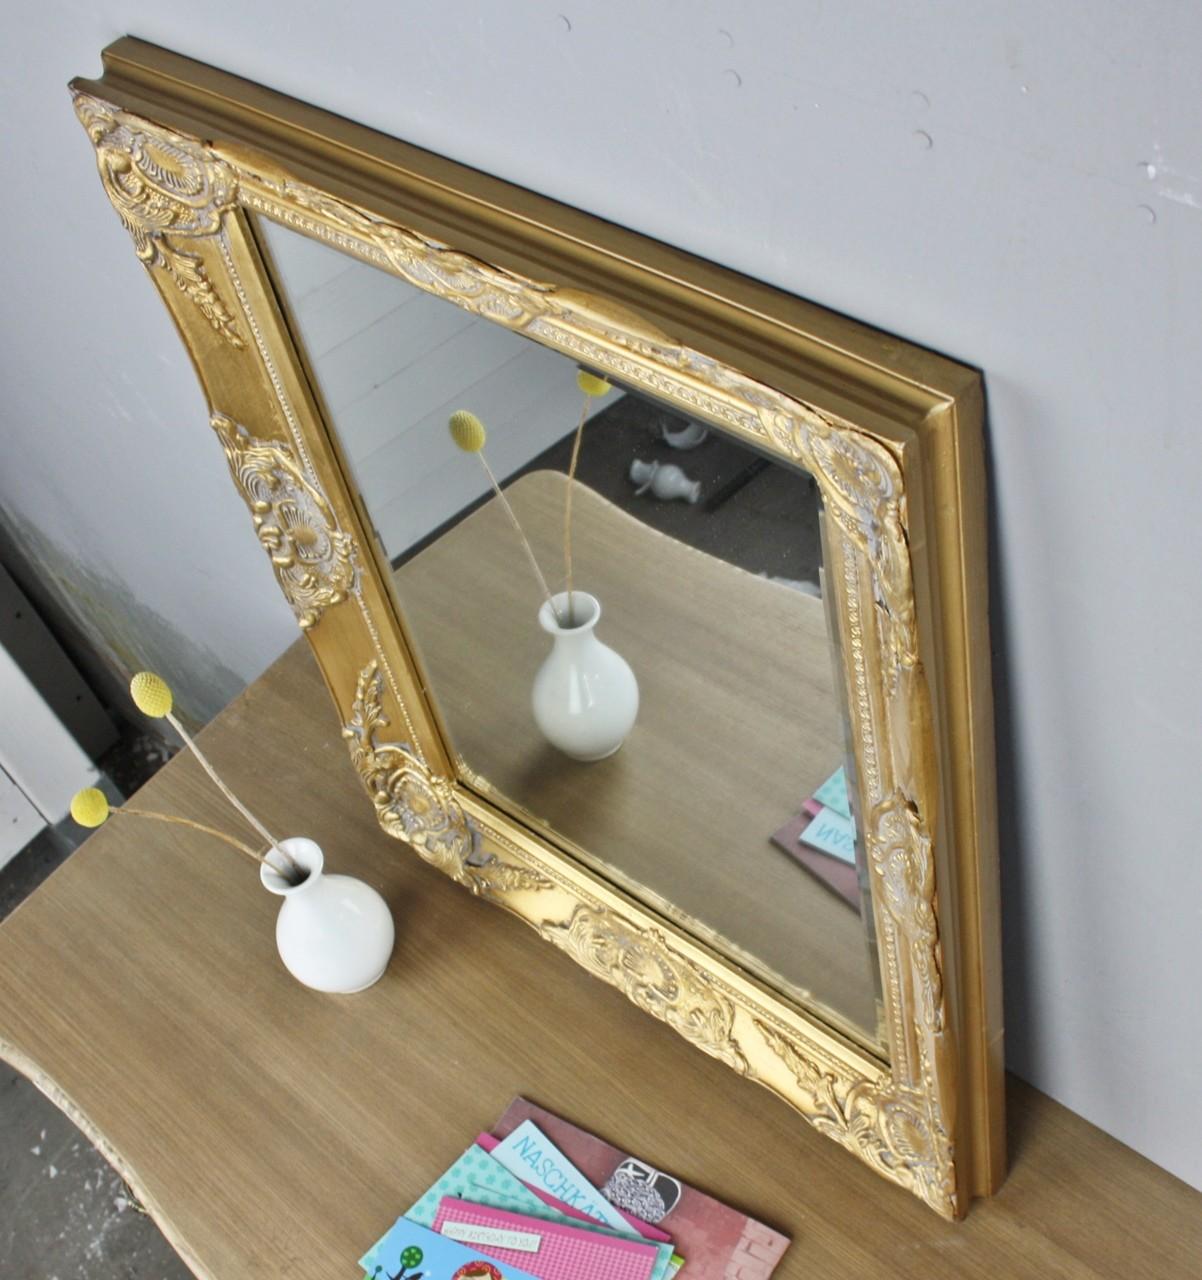 spiegel gold antik 62x52 cm holz neu wandspiegel barock. Black Bedroom Furniture Sets. Home Design Ideas